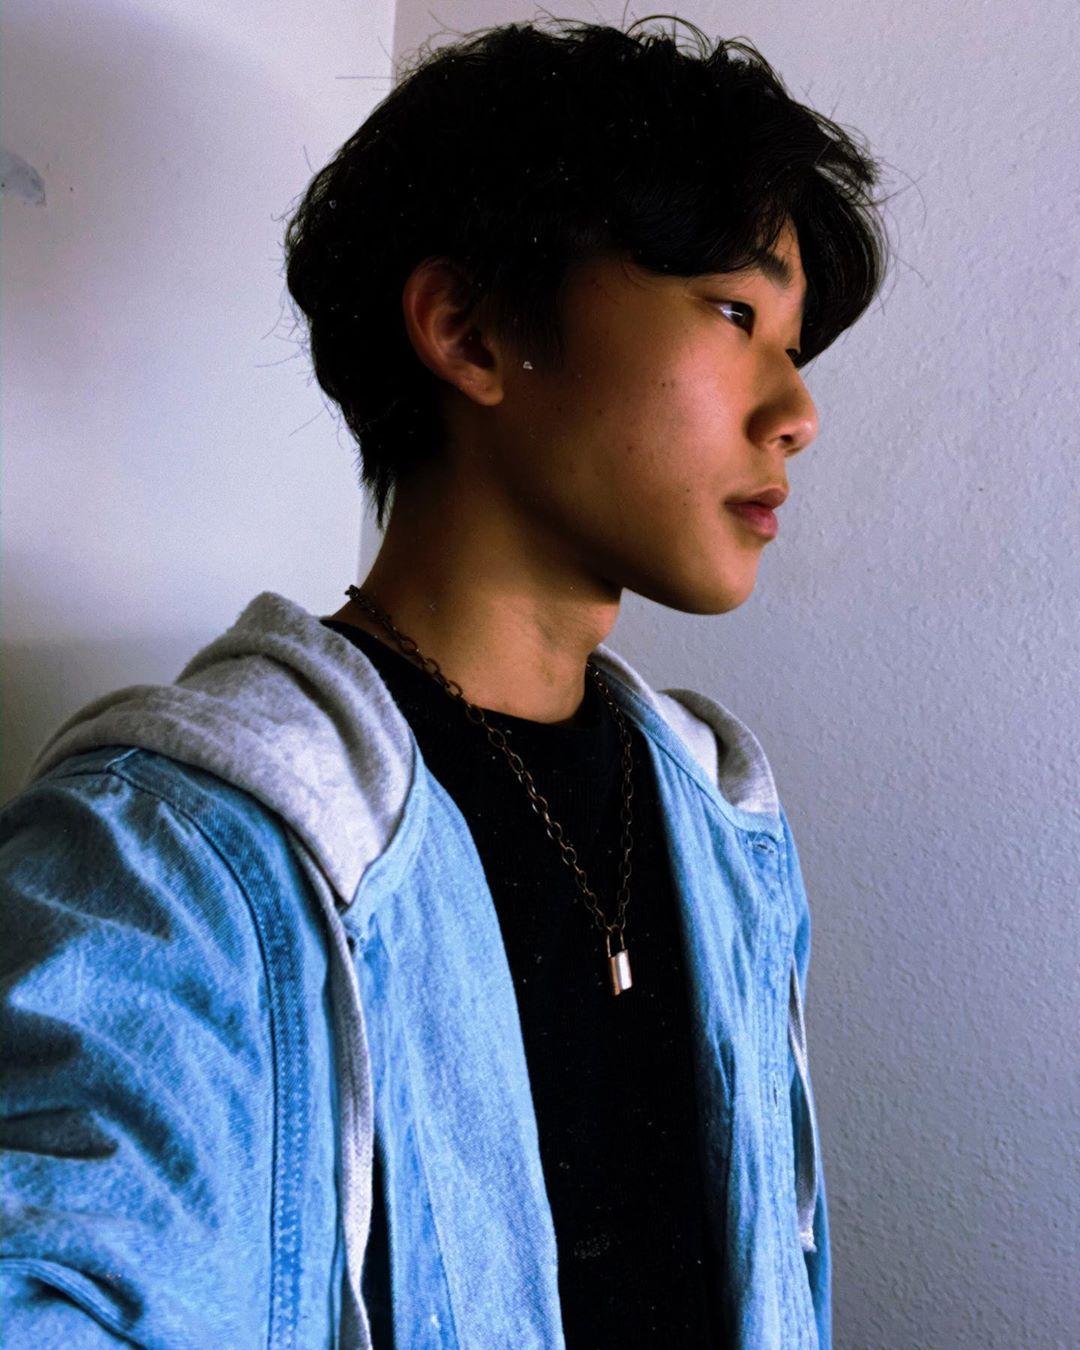 Asian teen boys cute search